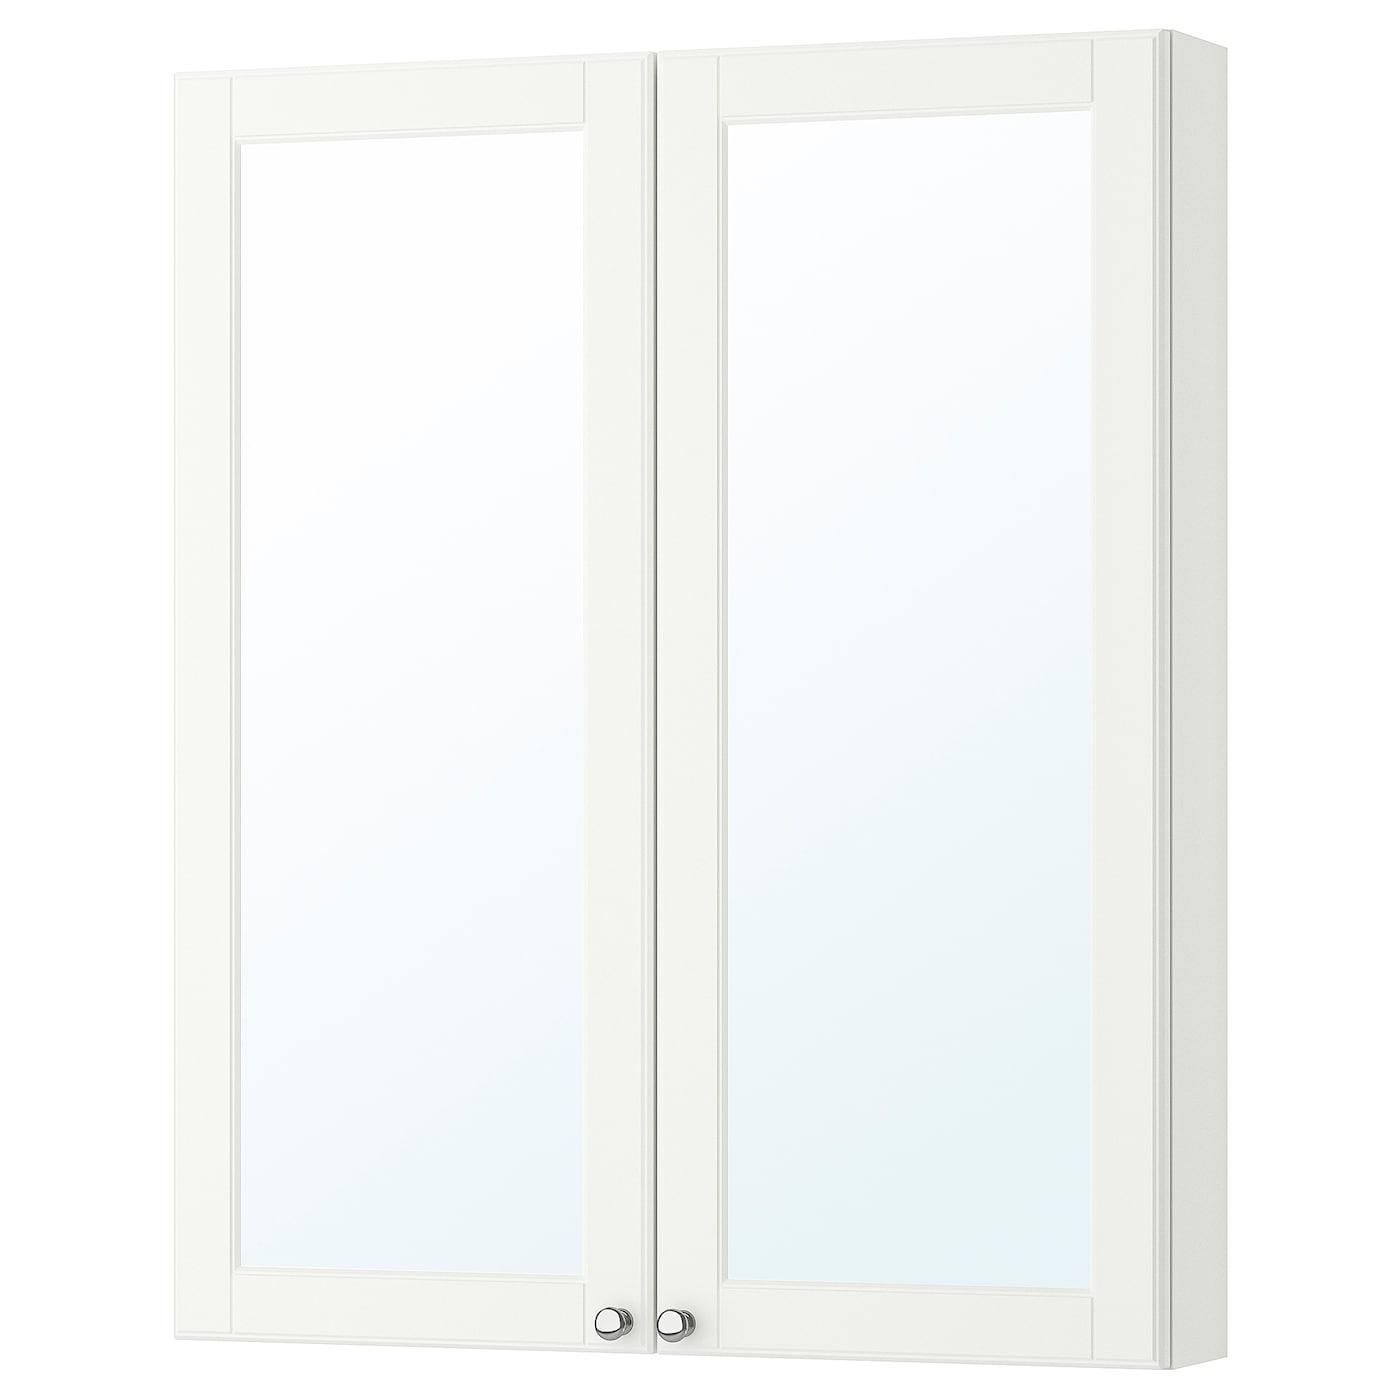 GODMORGON Spiegelschrank 2 Türen   Kasjön weiß   IKEA